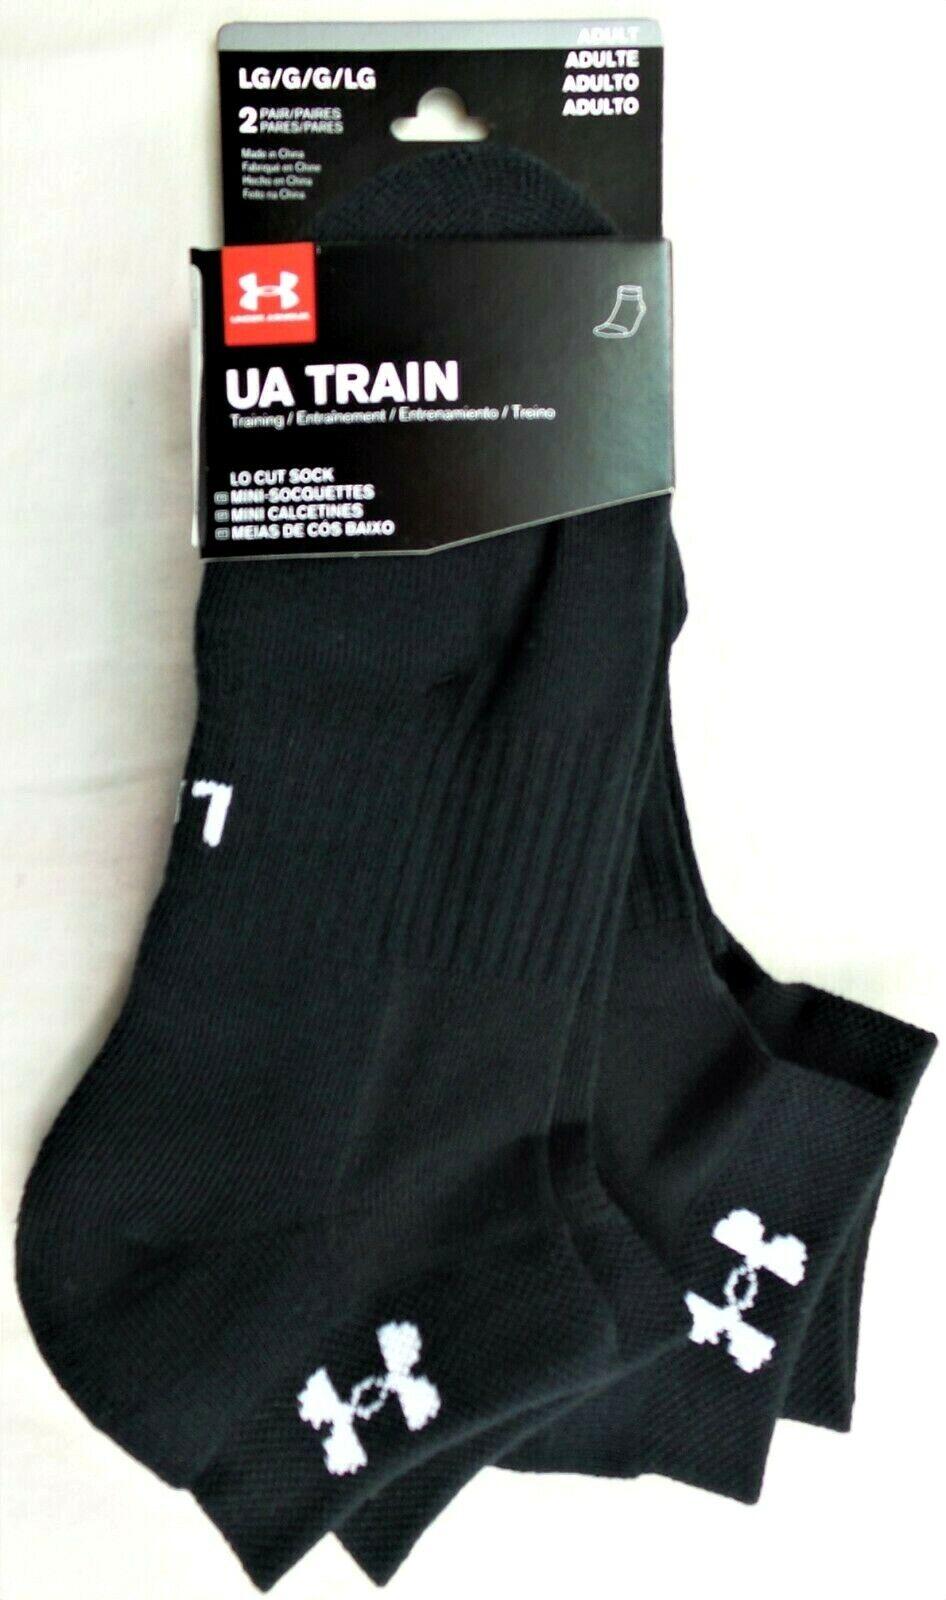 rbx sock boy 10 Pair Socks 9-11 Shoe 4-9.5